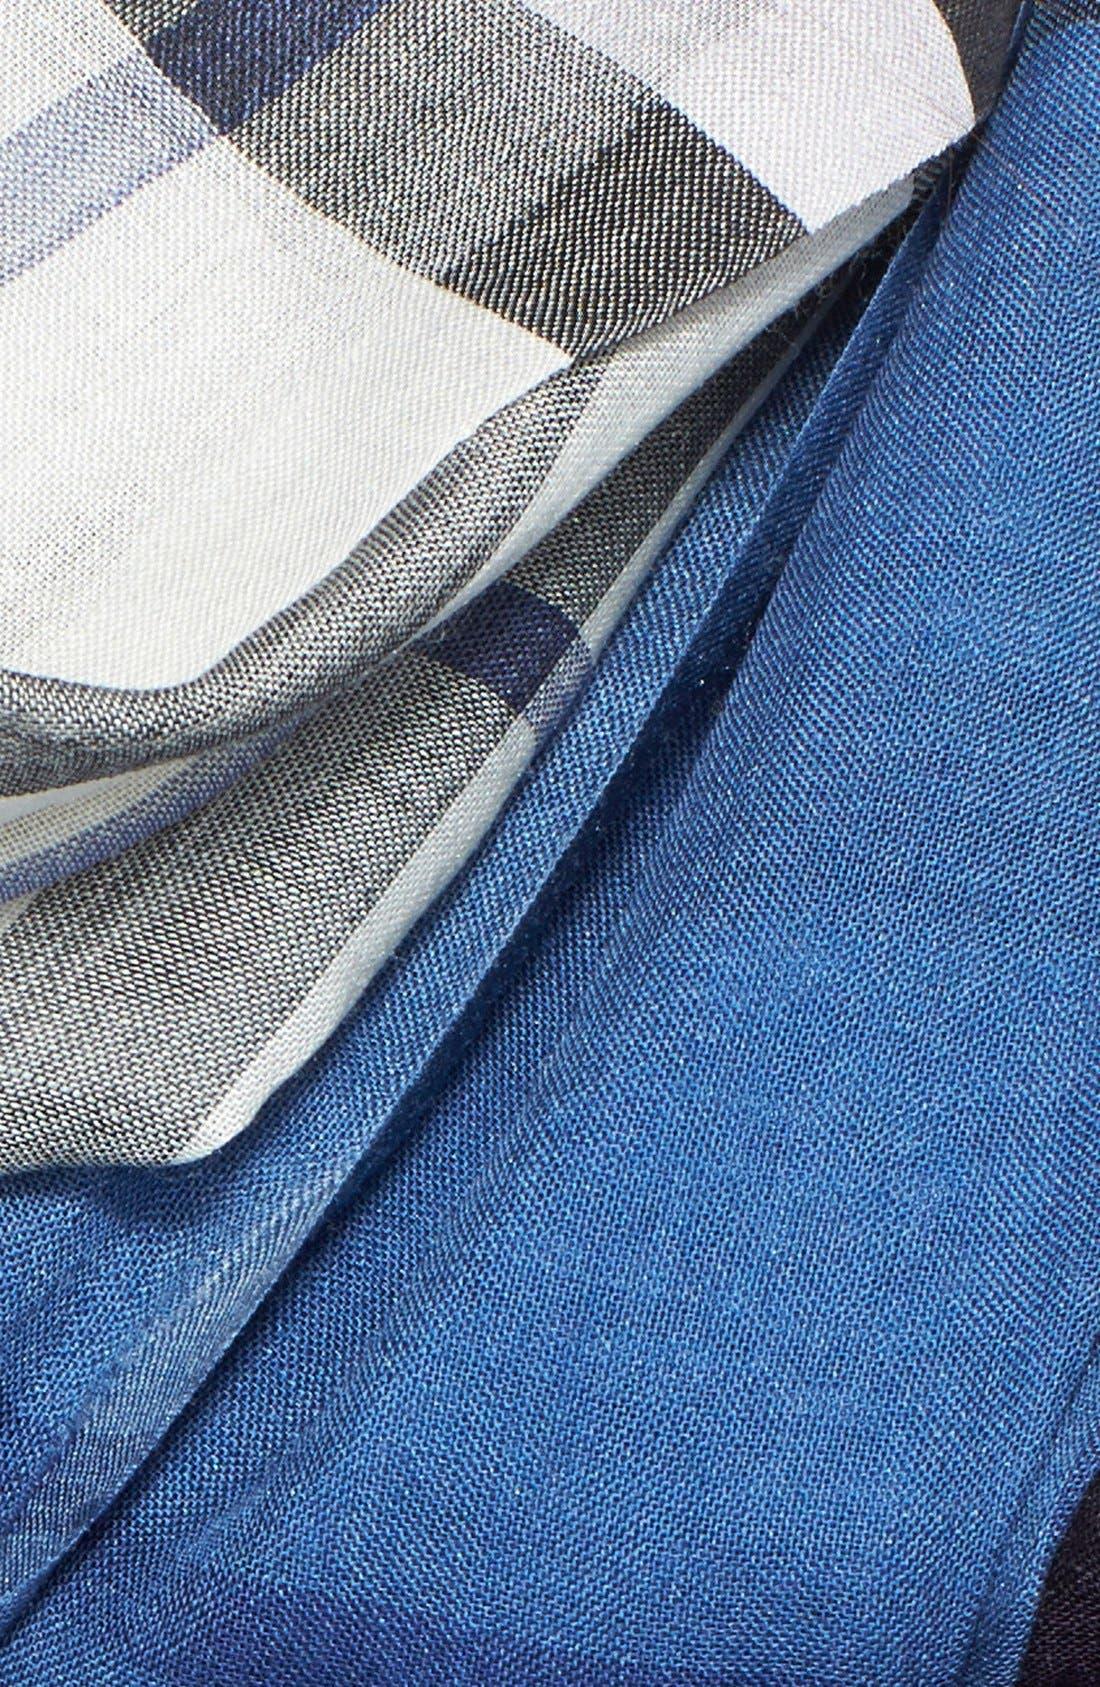 Alternate Image 3  - Burberry Ombré Check Wool & Silk Scarf